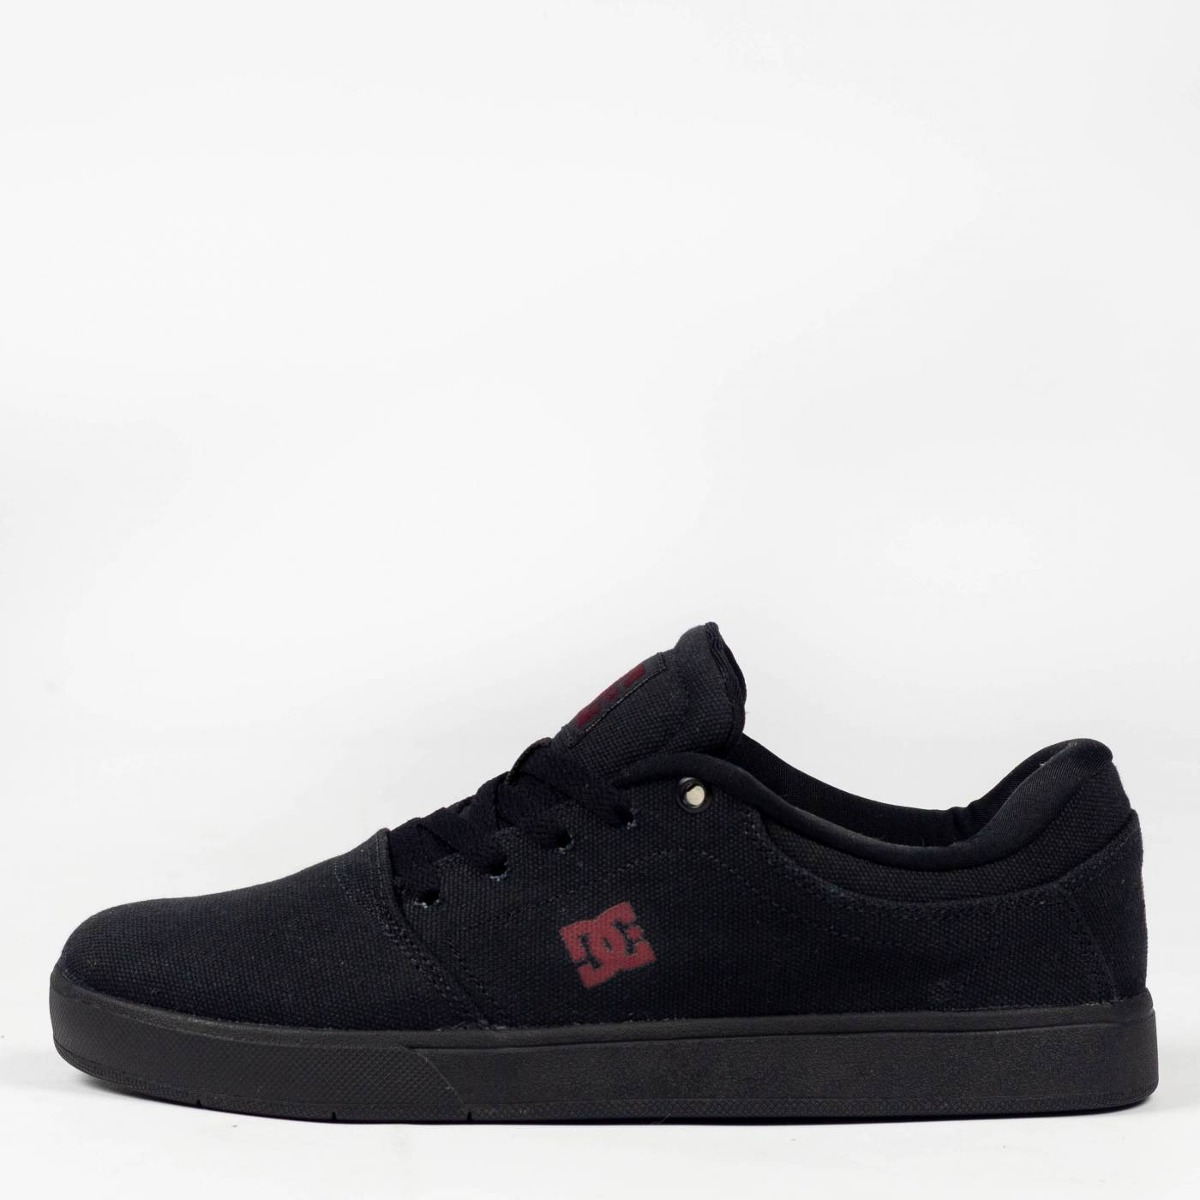 efb3347977 tênis dc shoes skate crisis tx la black dark grey original. Carregando zoom.